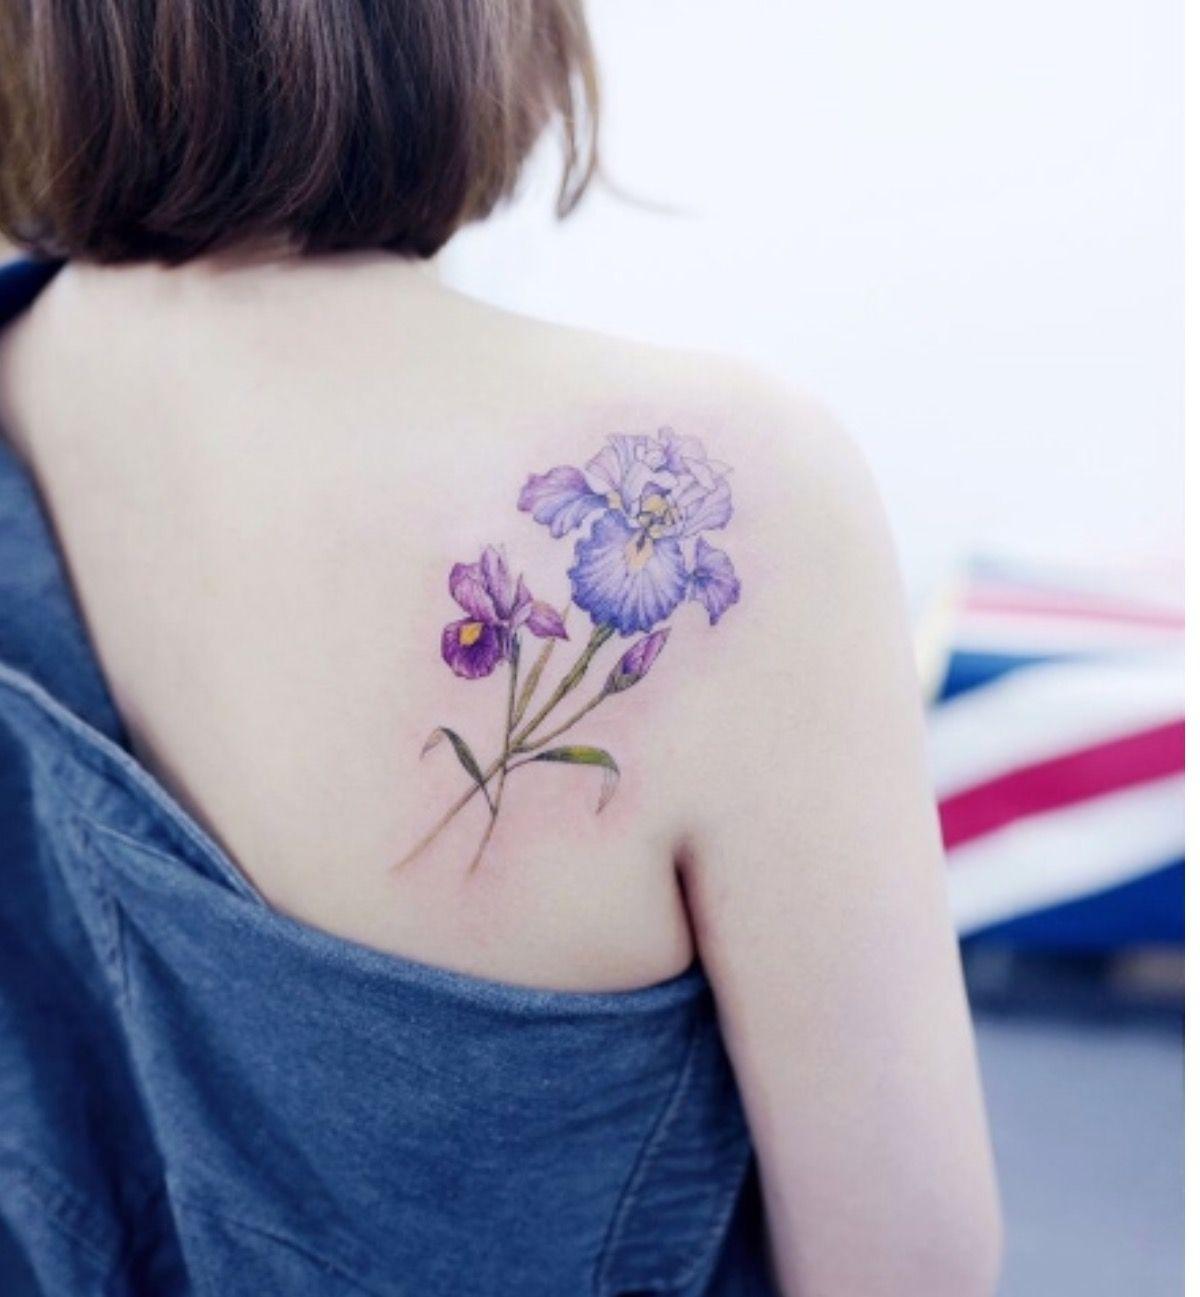 Pin by lutz gruno on watercolor tattoo pinterest tattoo tattoo 12 more beautiful flower tattoo ideas for women crazyforus izmirmasajfo Images